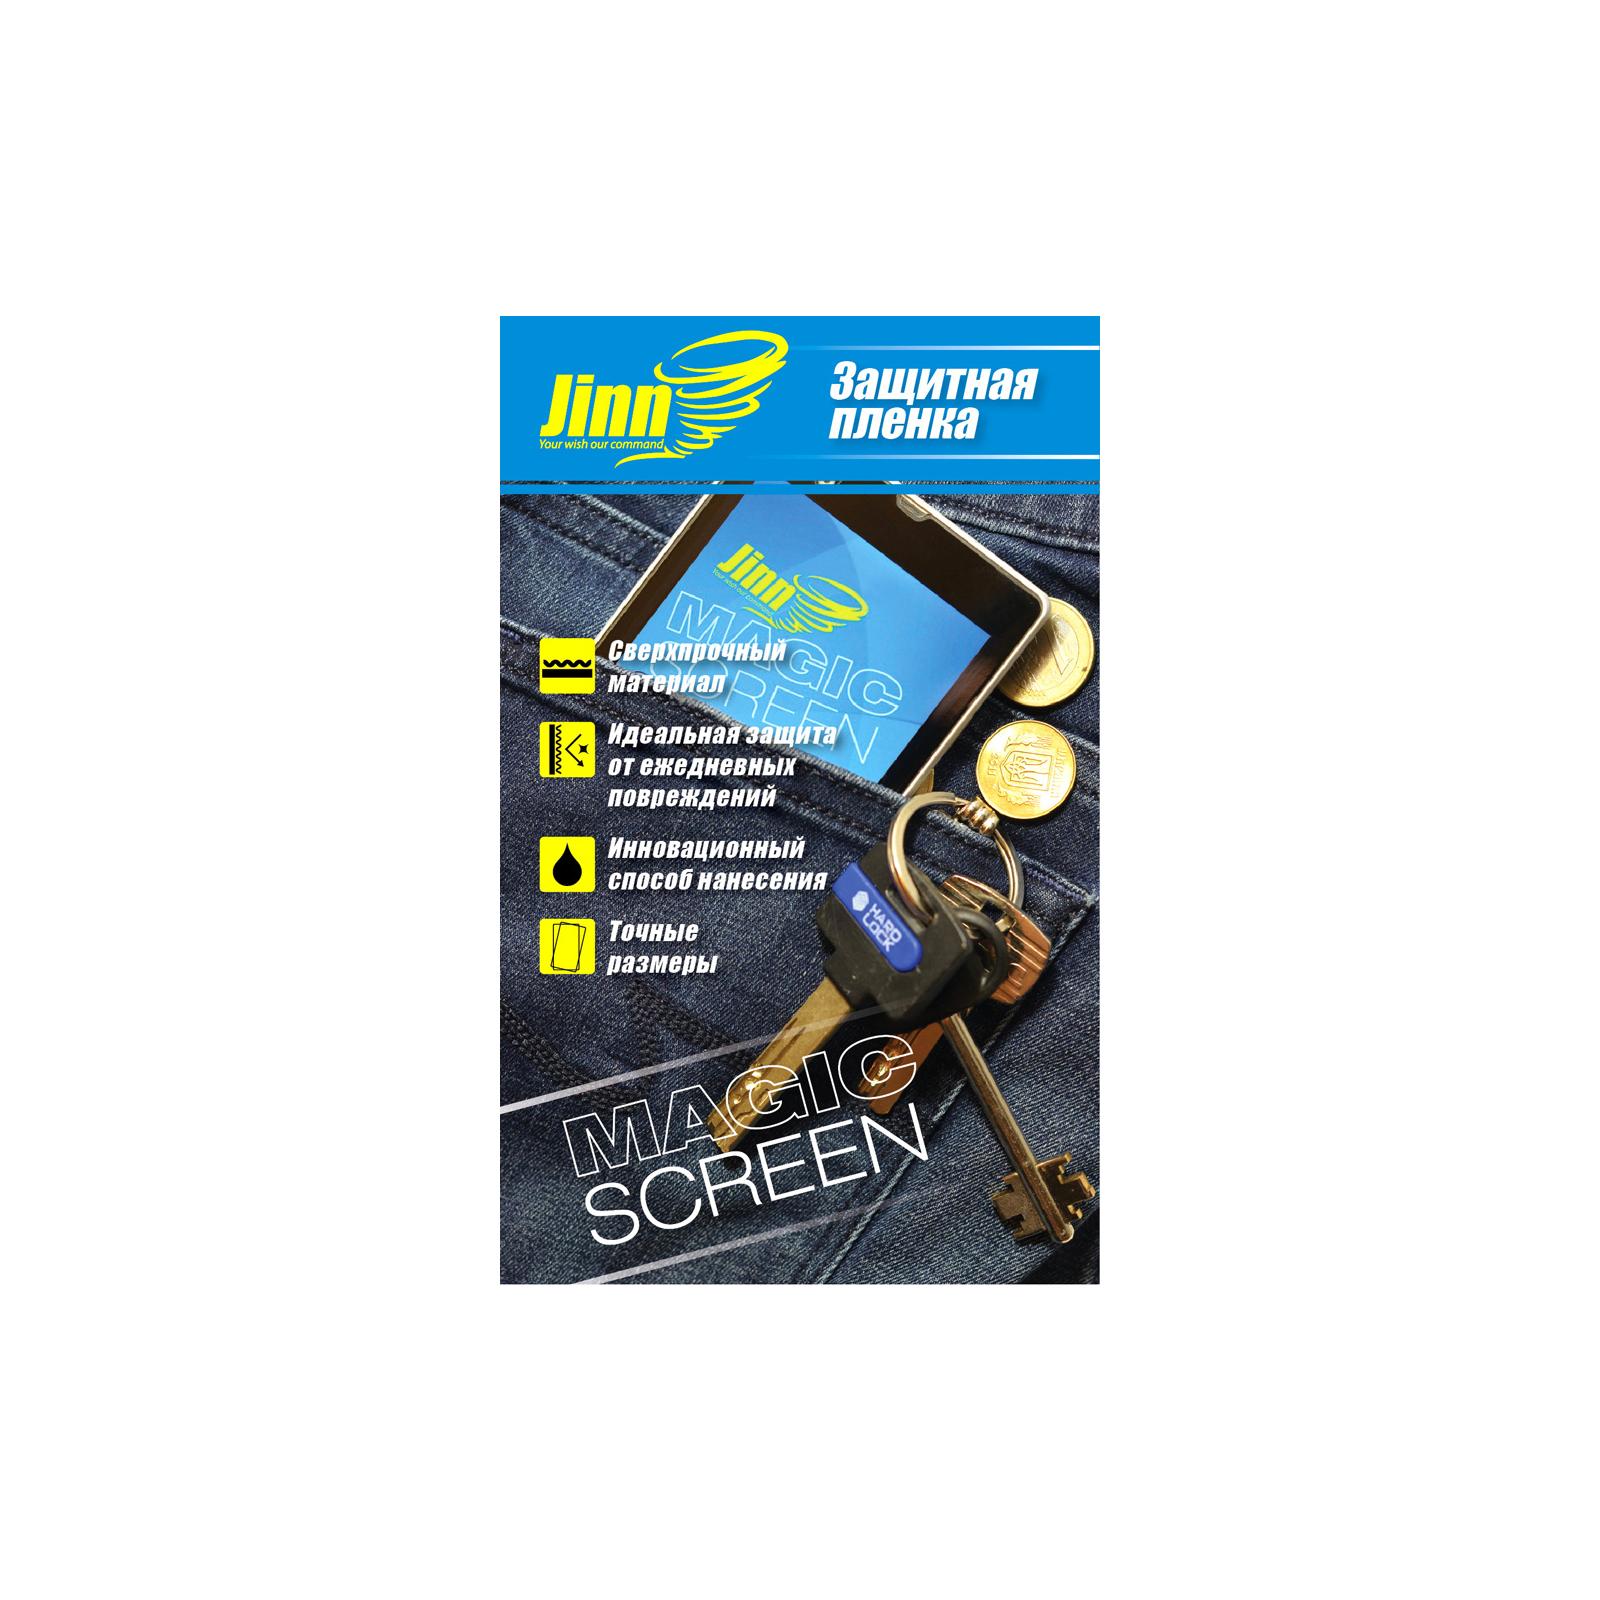 Пленка защитная JINN ультрапрочная Magic Screen для Samsung Galaxy S Duos S7562 (Samsung Galaxy S Duos front)